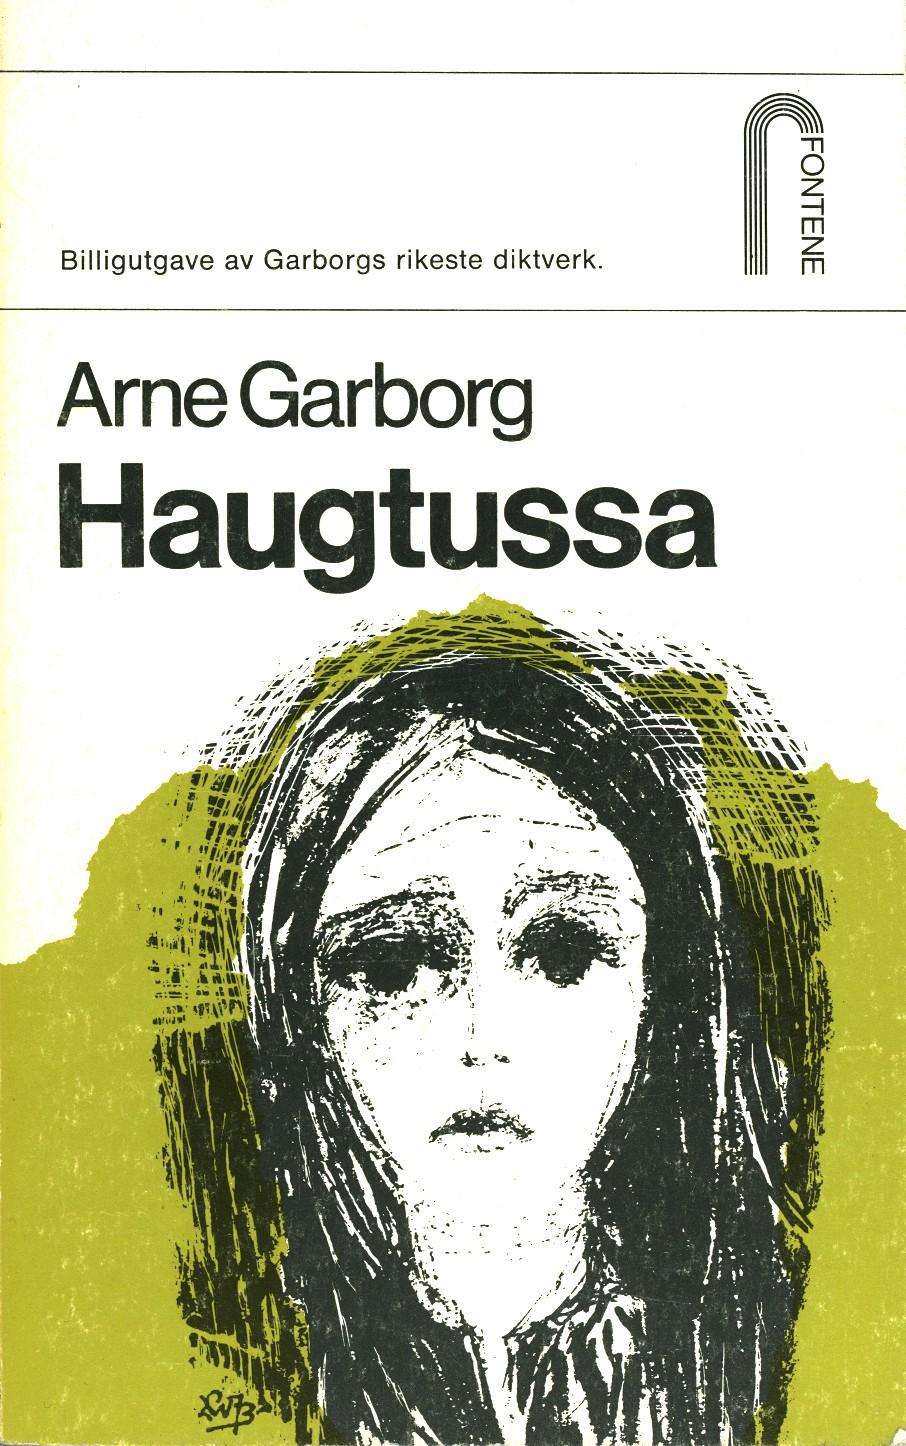 Arne Garborg: Haugtussa